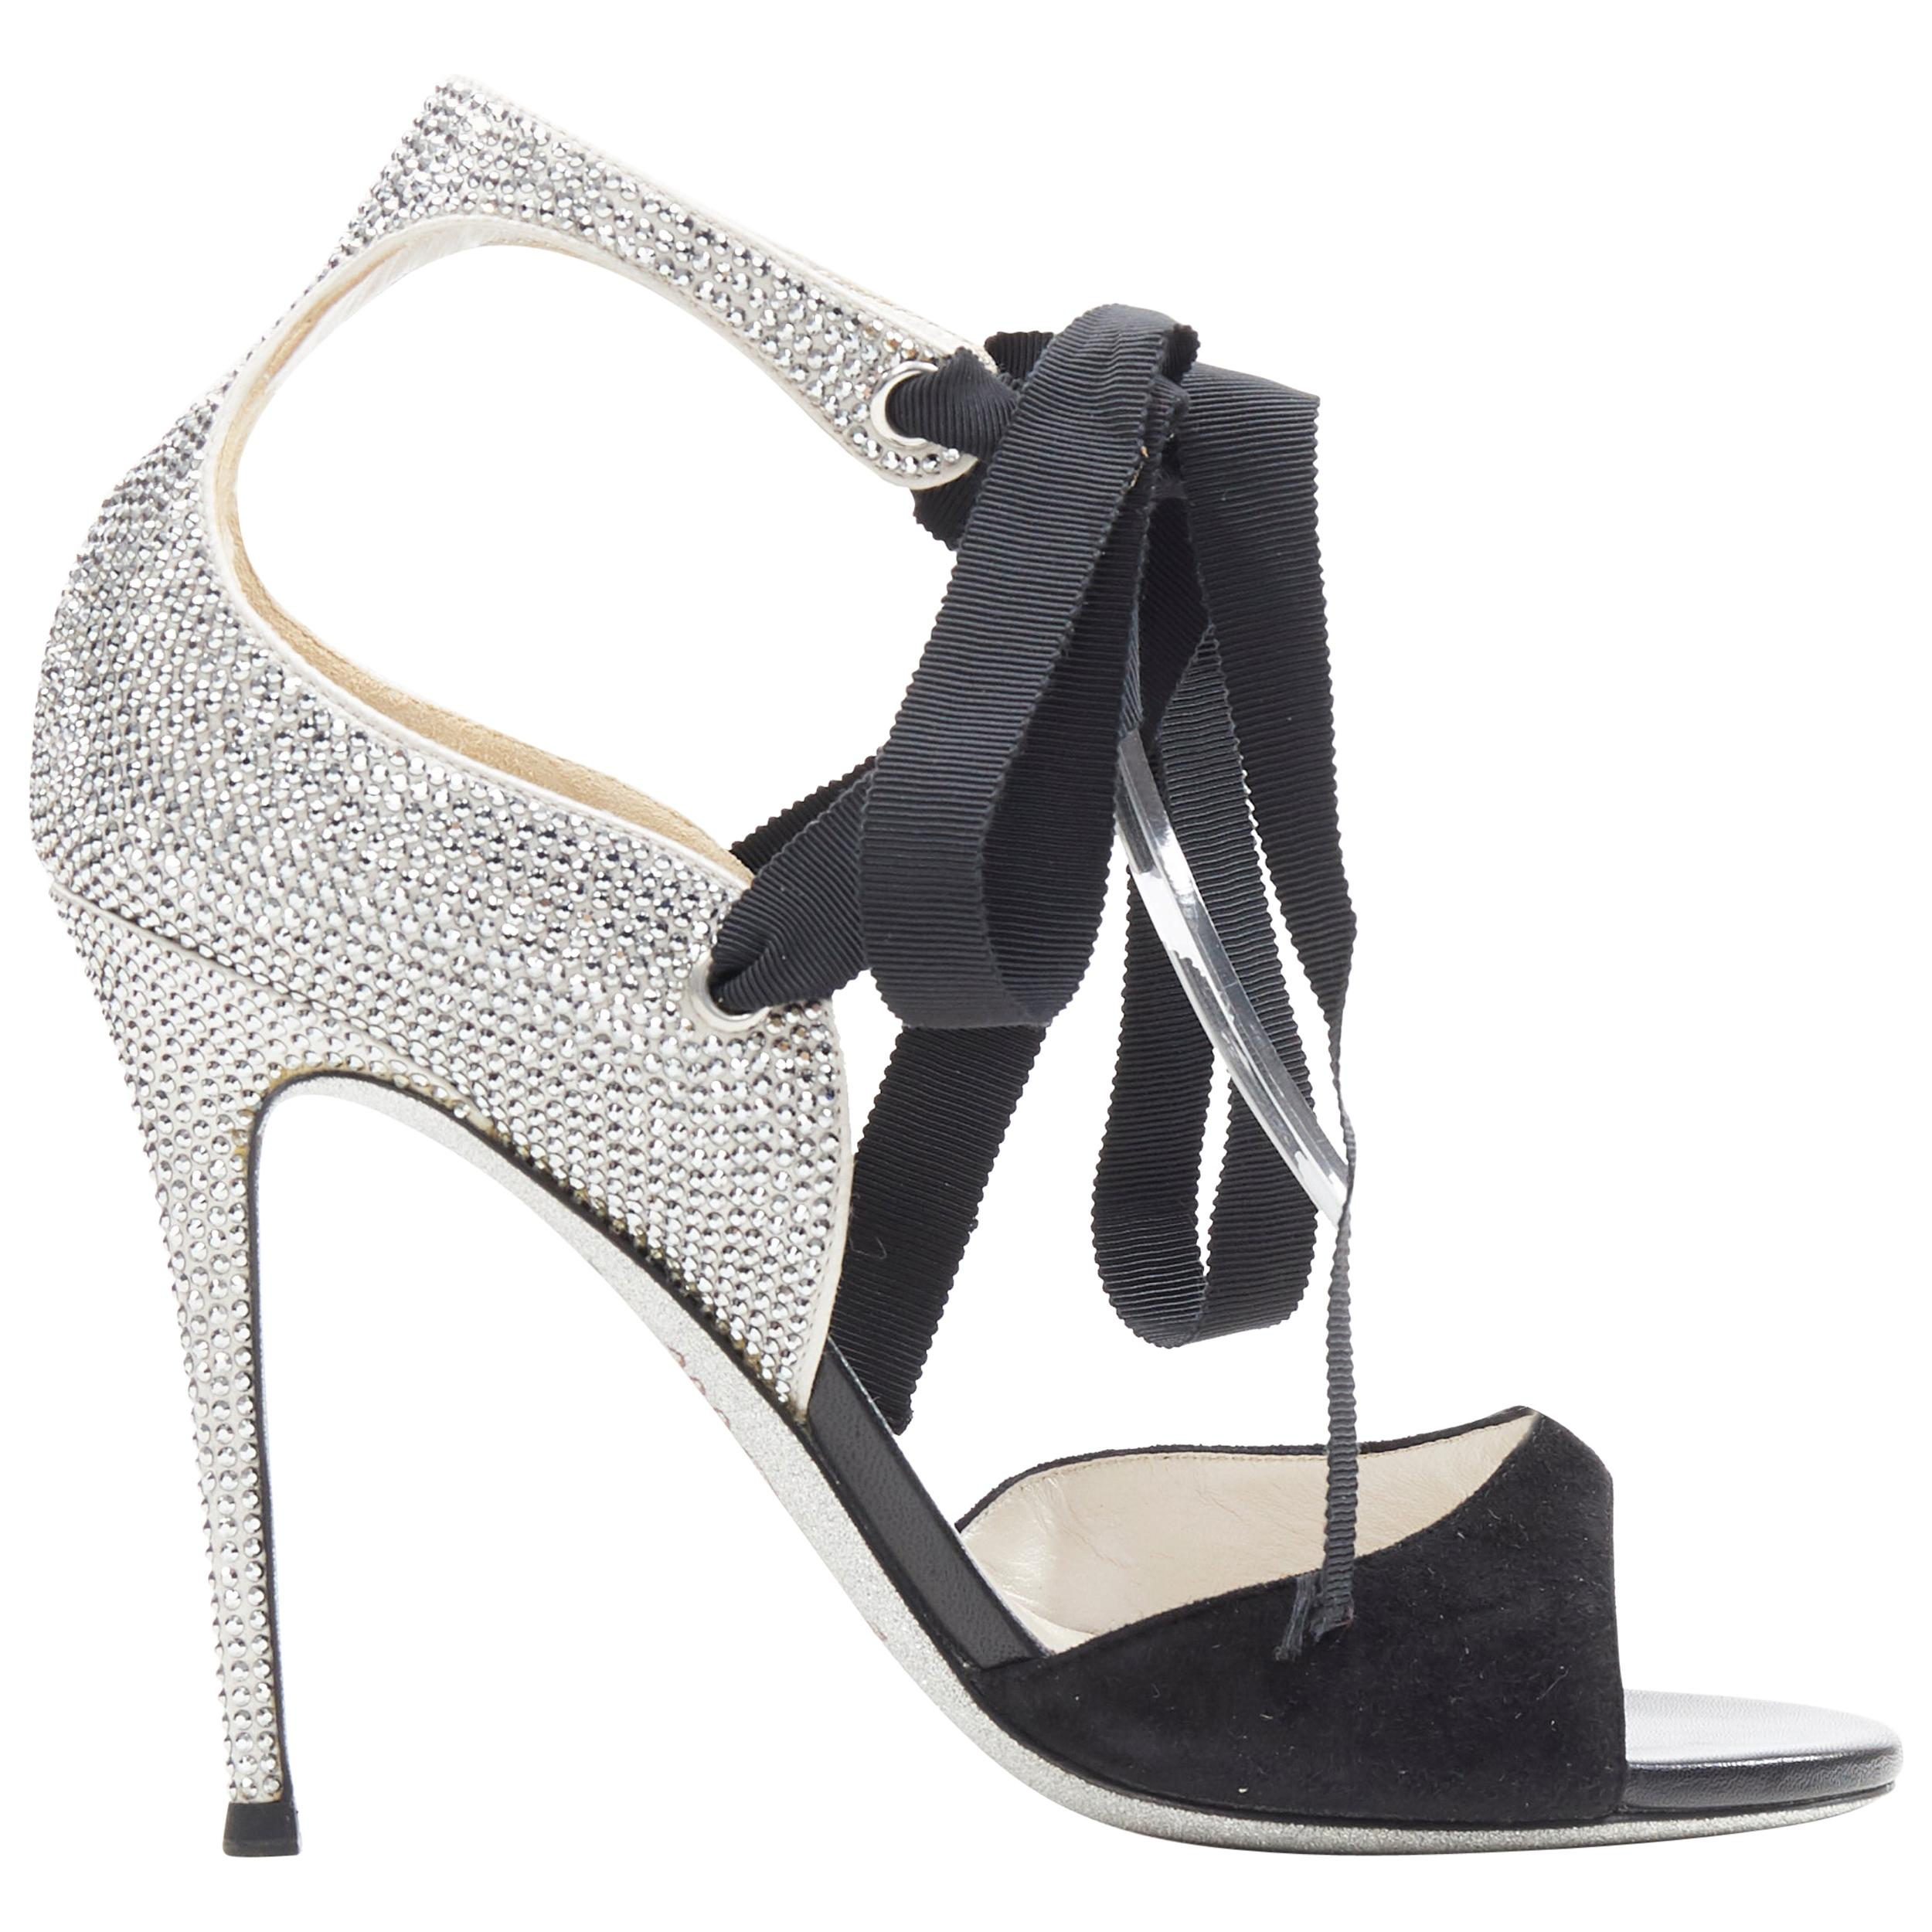 RENE CAOVILLA silver crystal strass embellished black suede ribbon sandal EU37